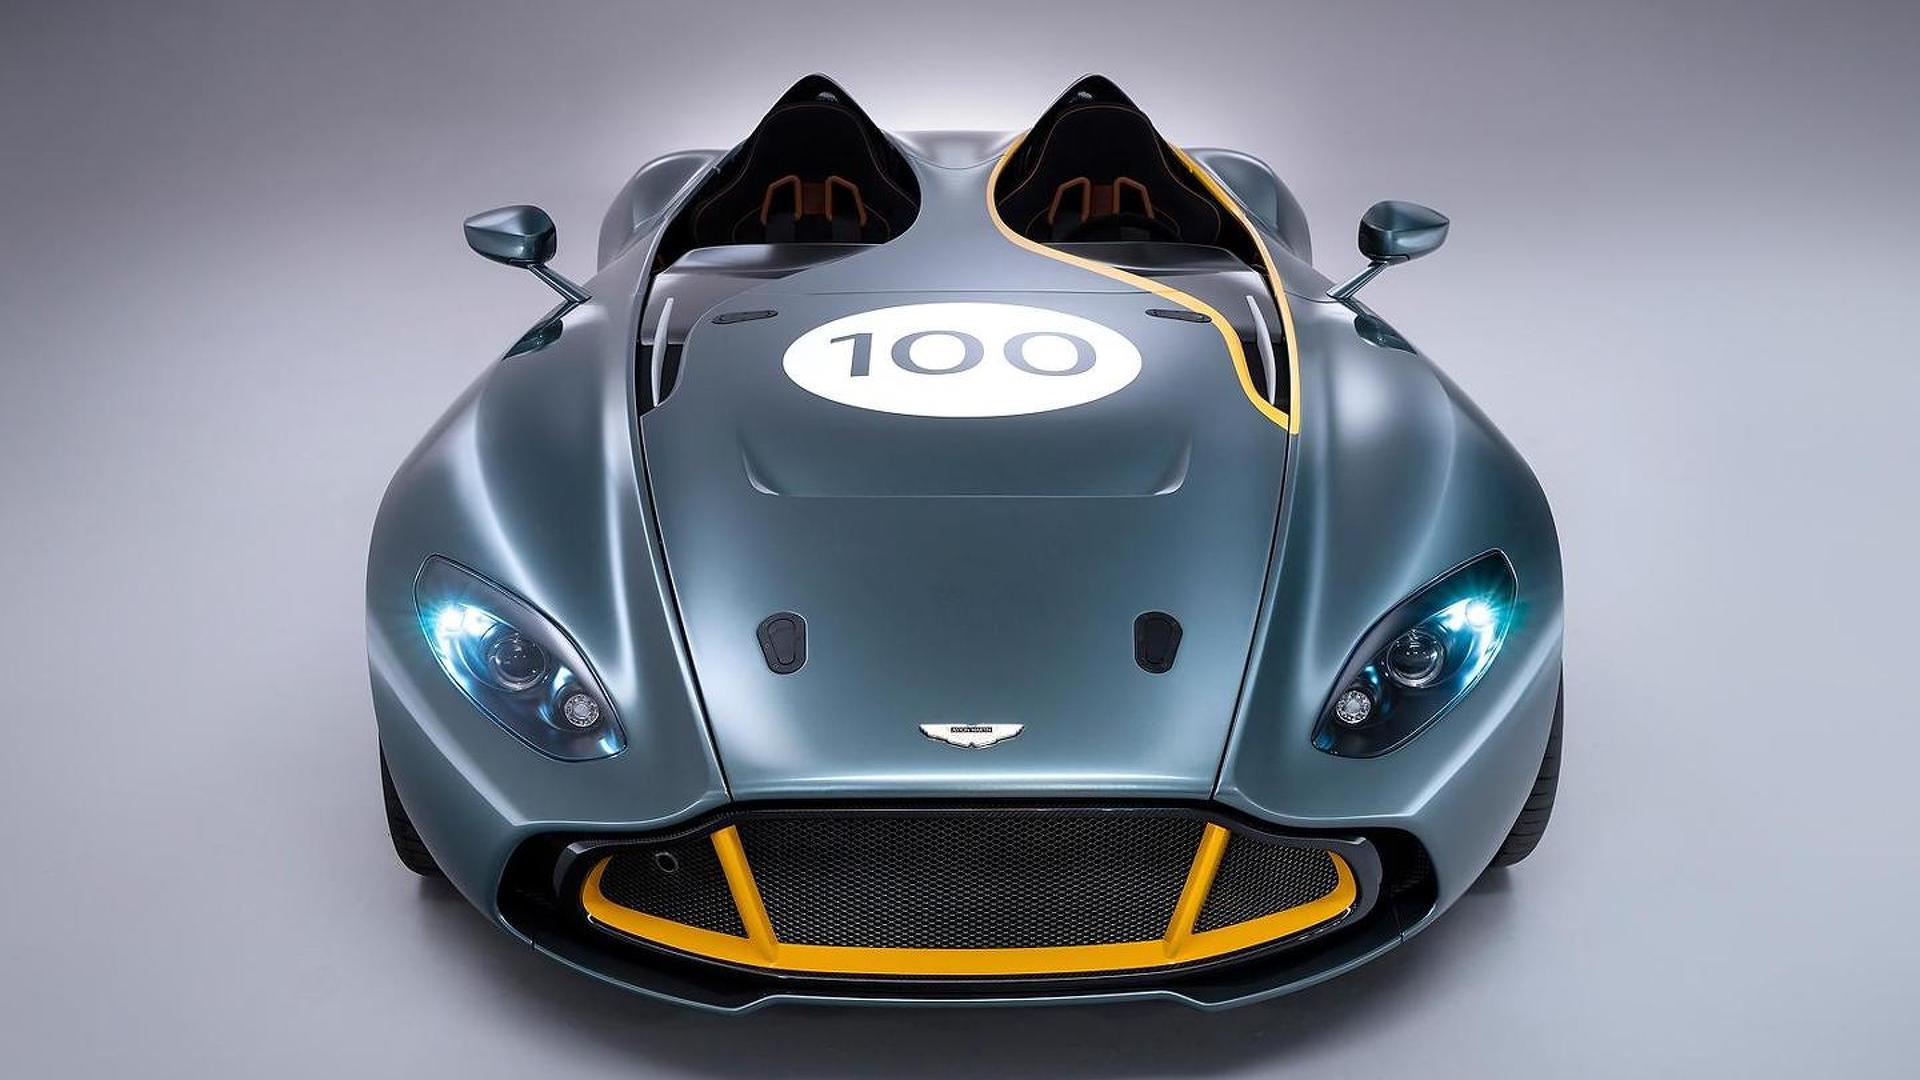 Aston Martin Cc100 Concept Driven By Jay Leno Video